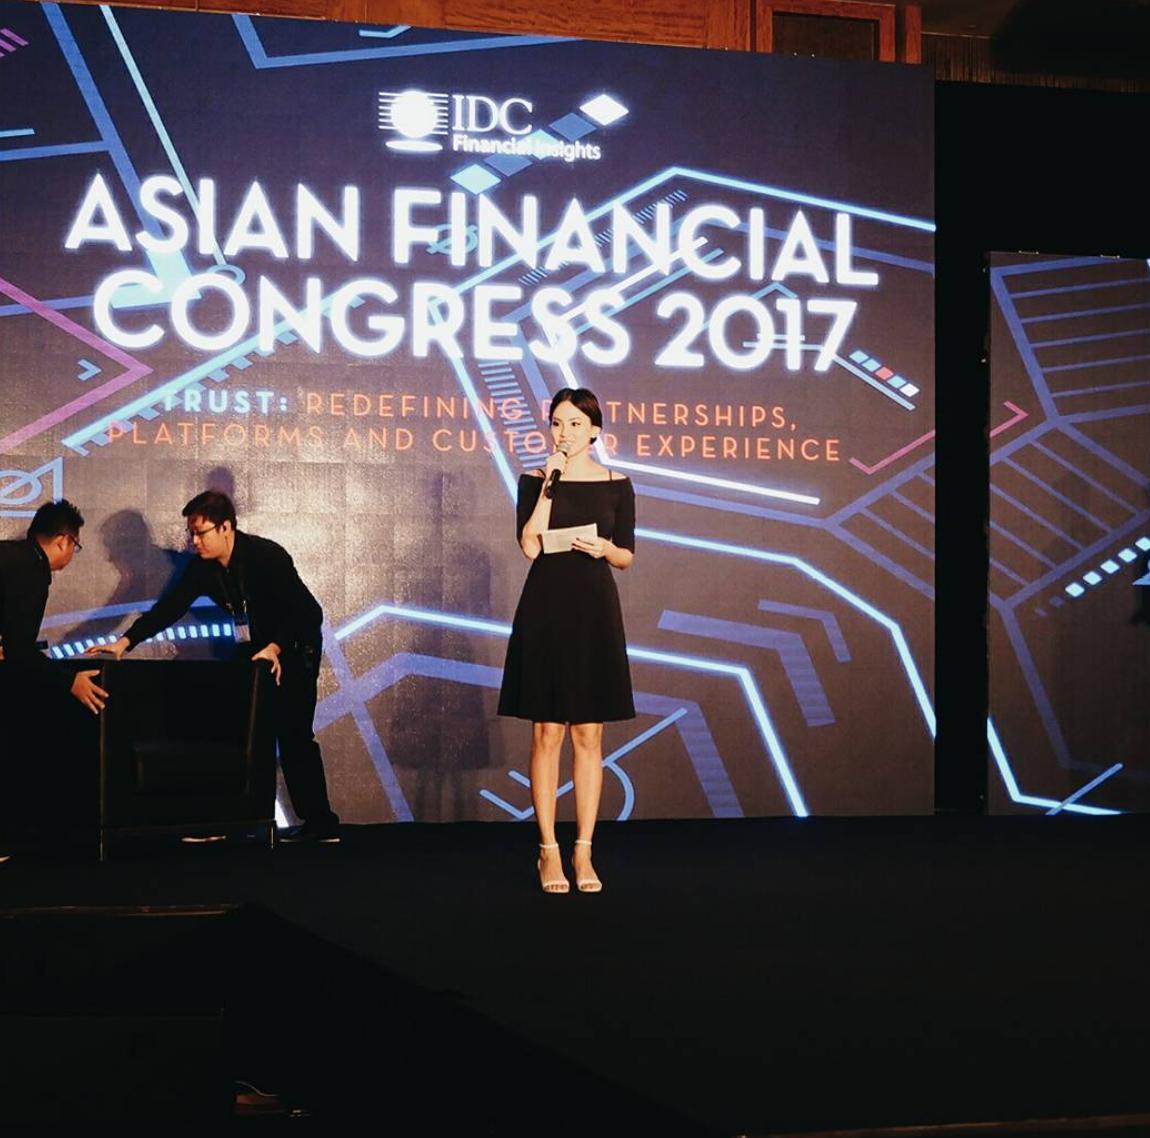 Asian Financial Congress 2017